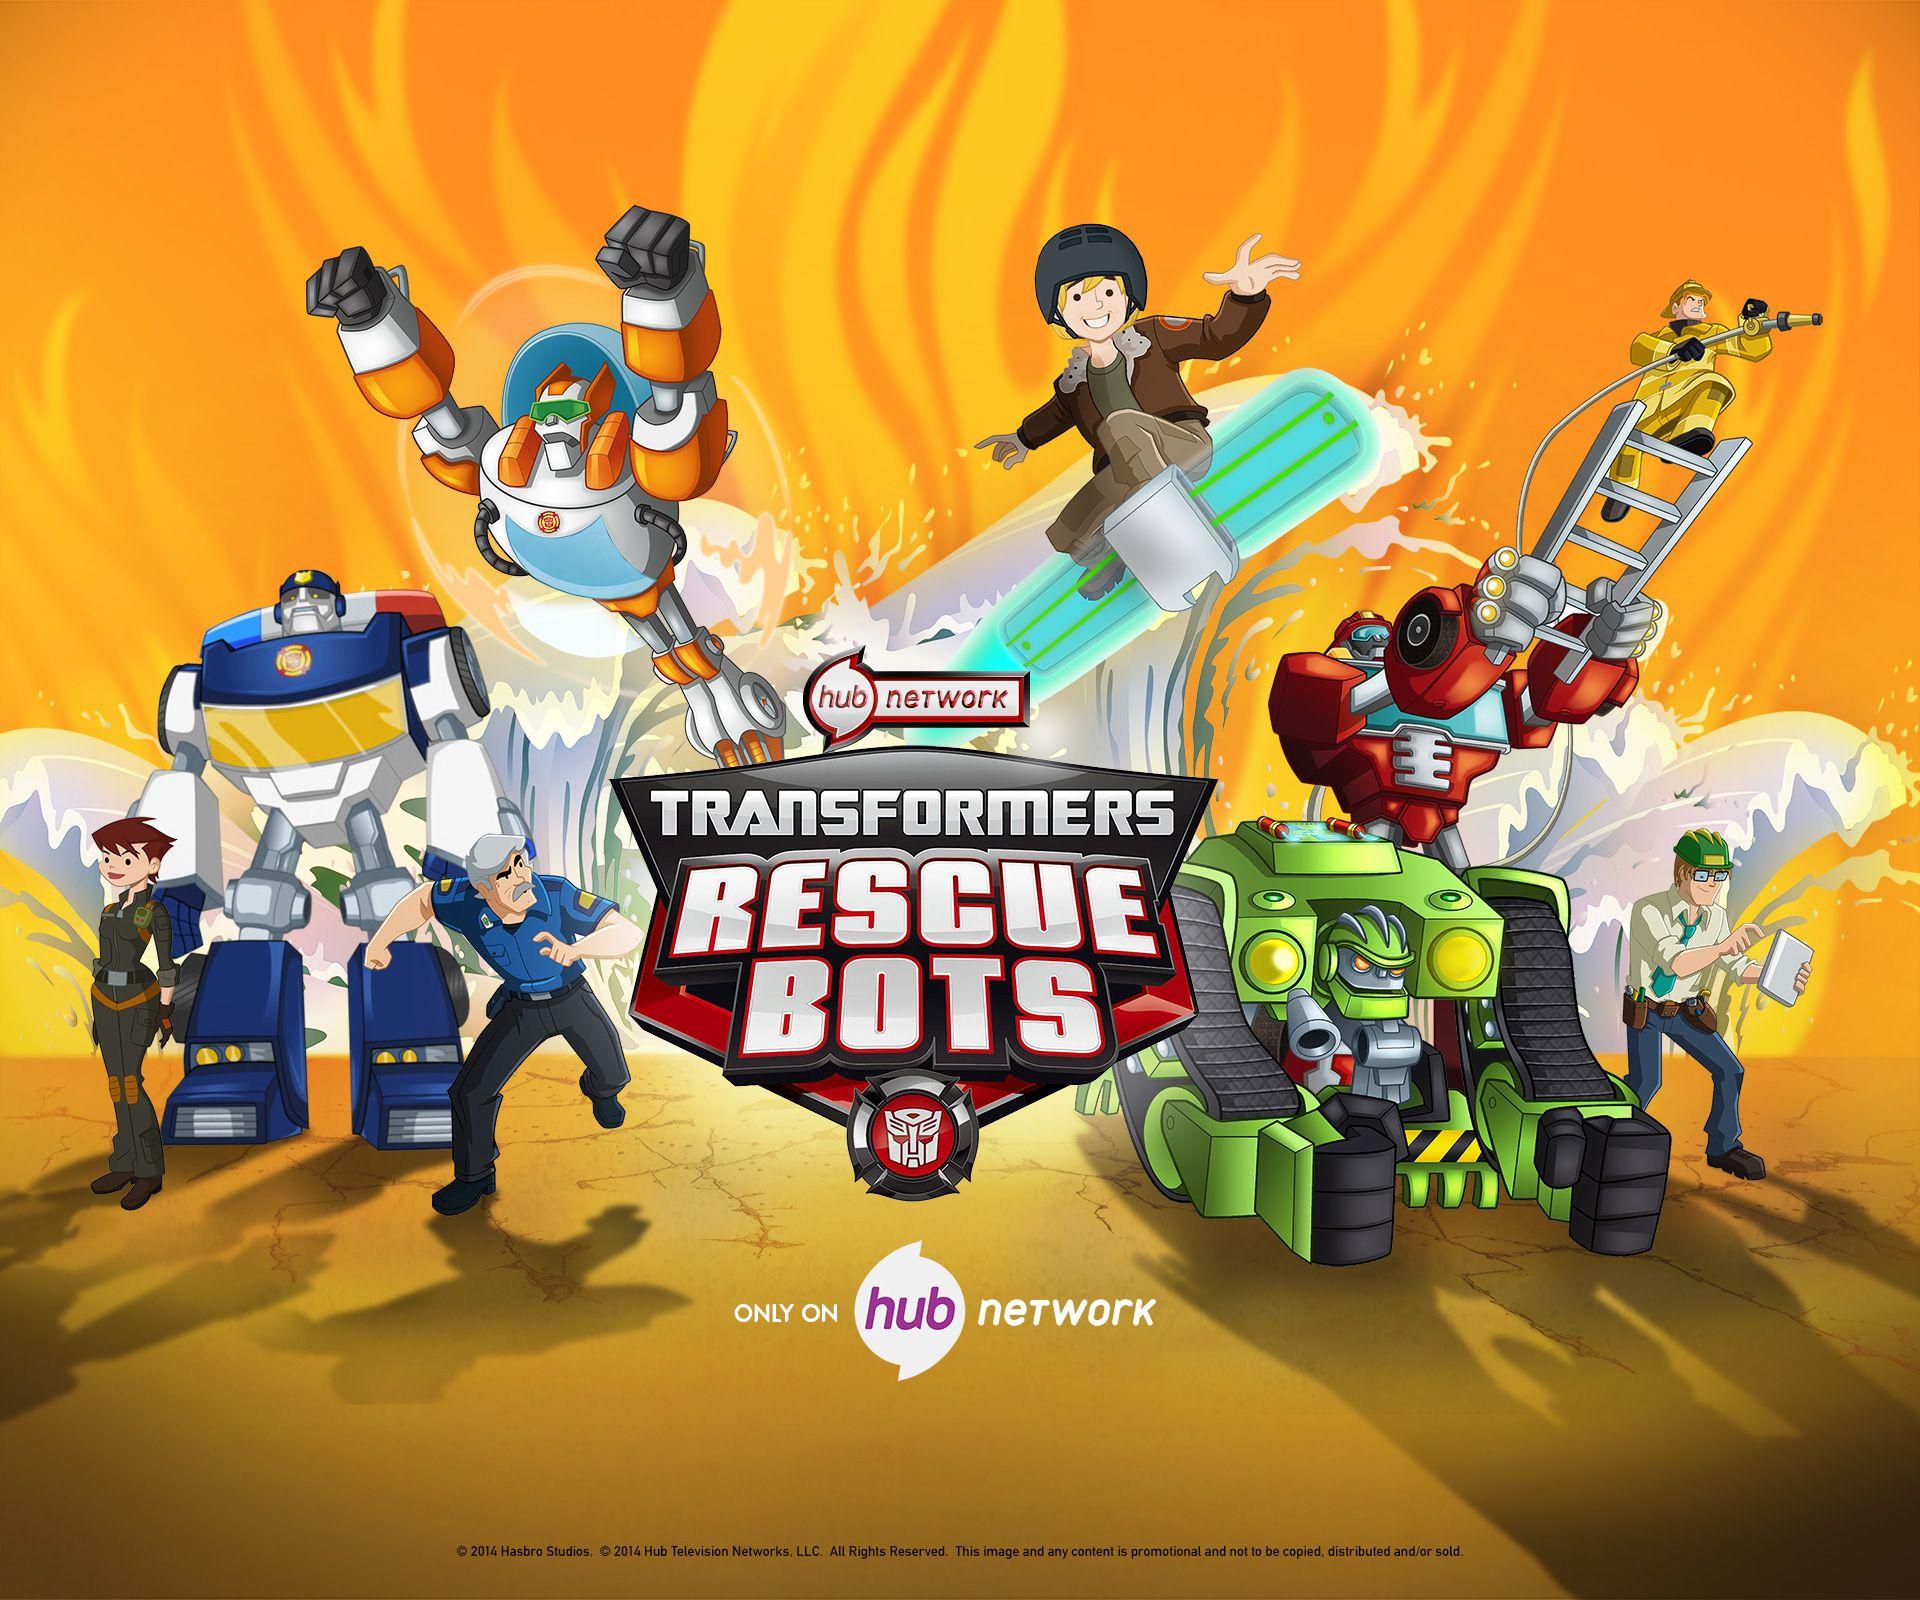 Transformers Rescue Bots Wallpaper